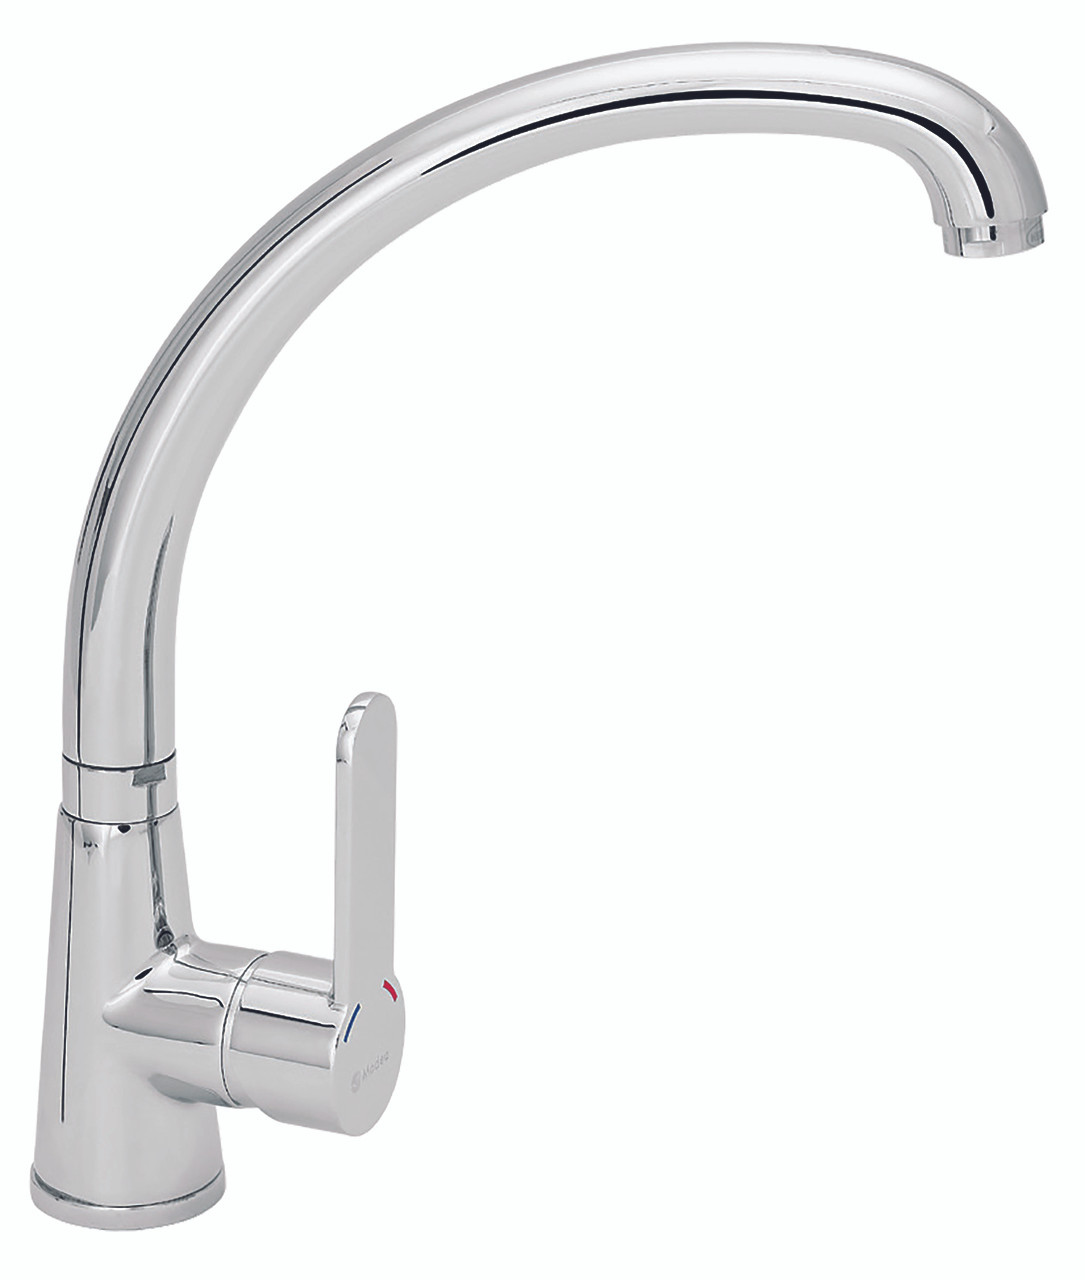 Sink mixer OMEGA Heavy duty, Spout Fuse type